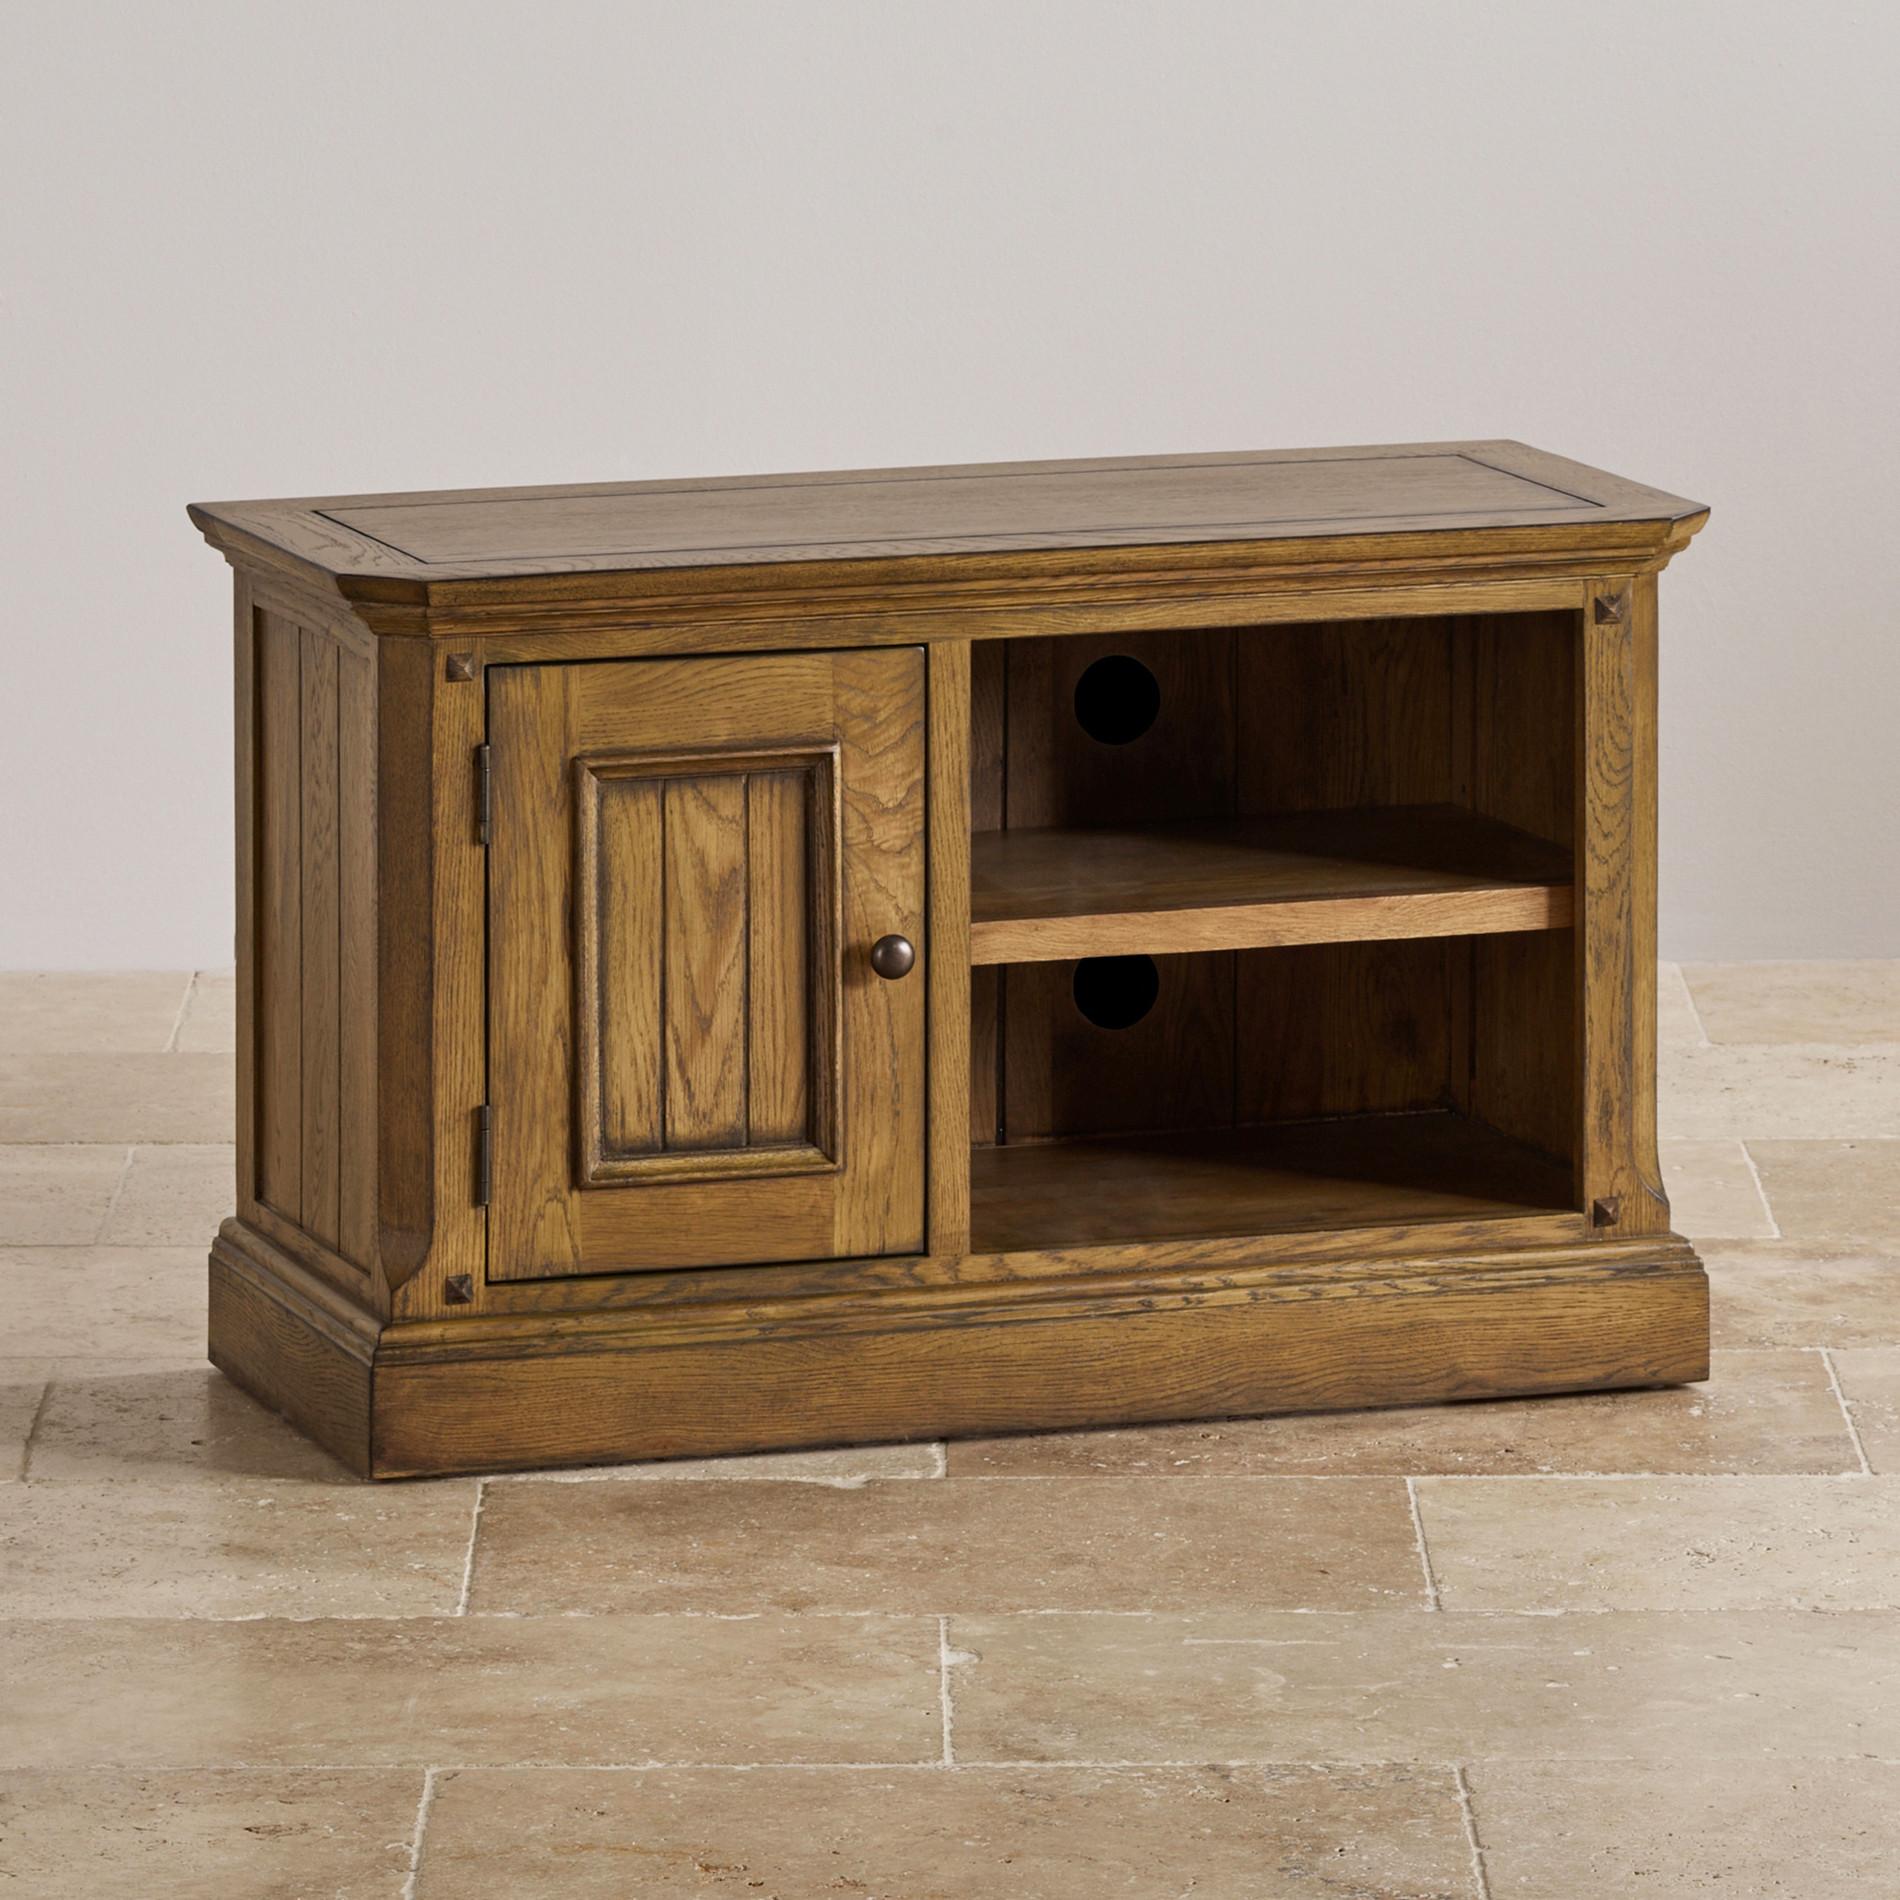 Manor House Small TV Unit in Solid Oak Oak Furniture Land